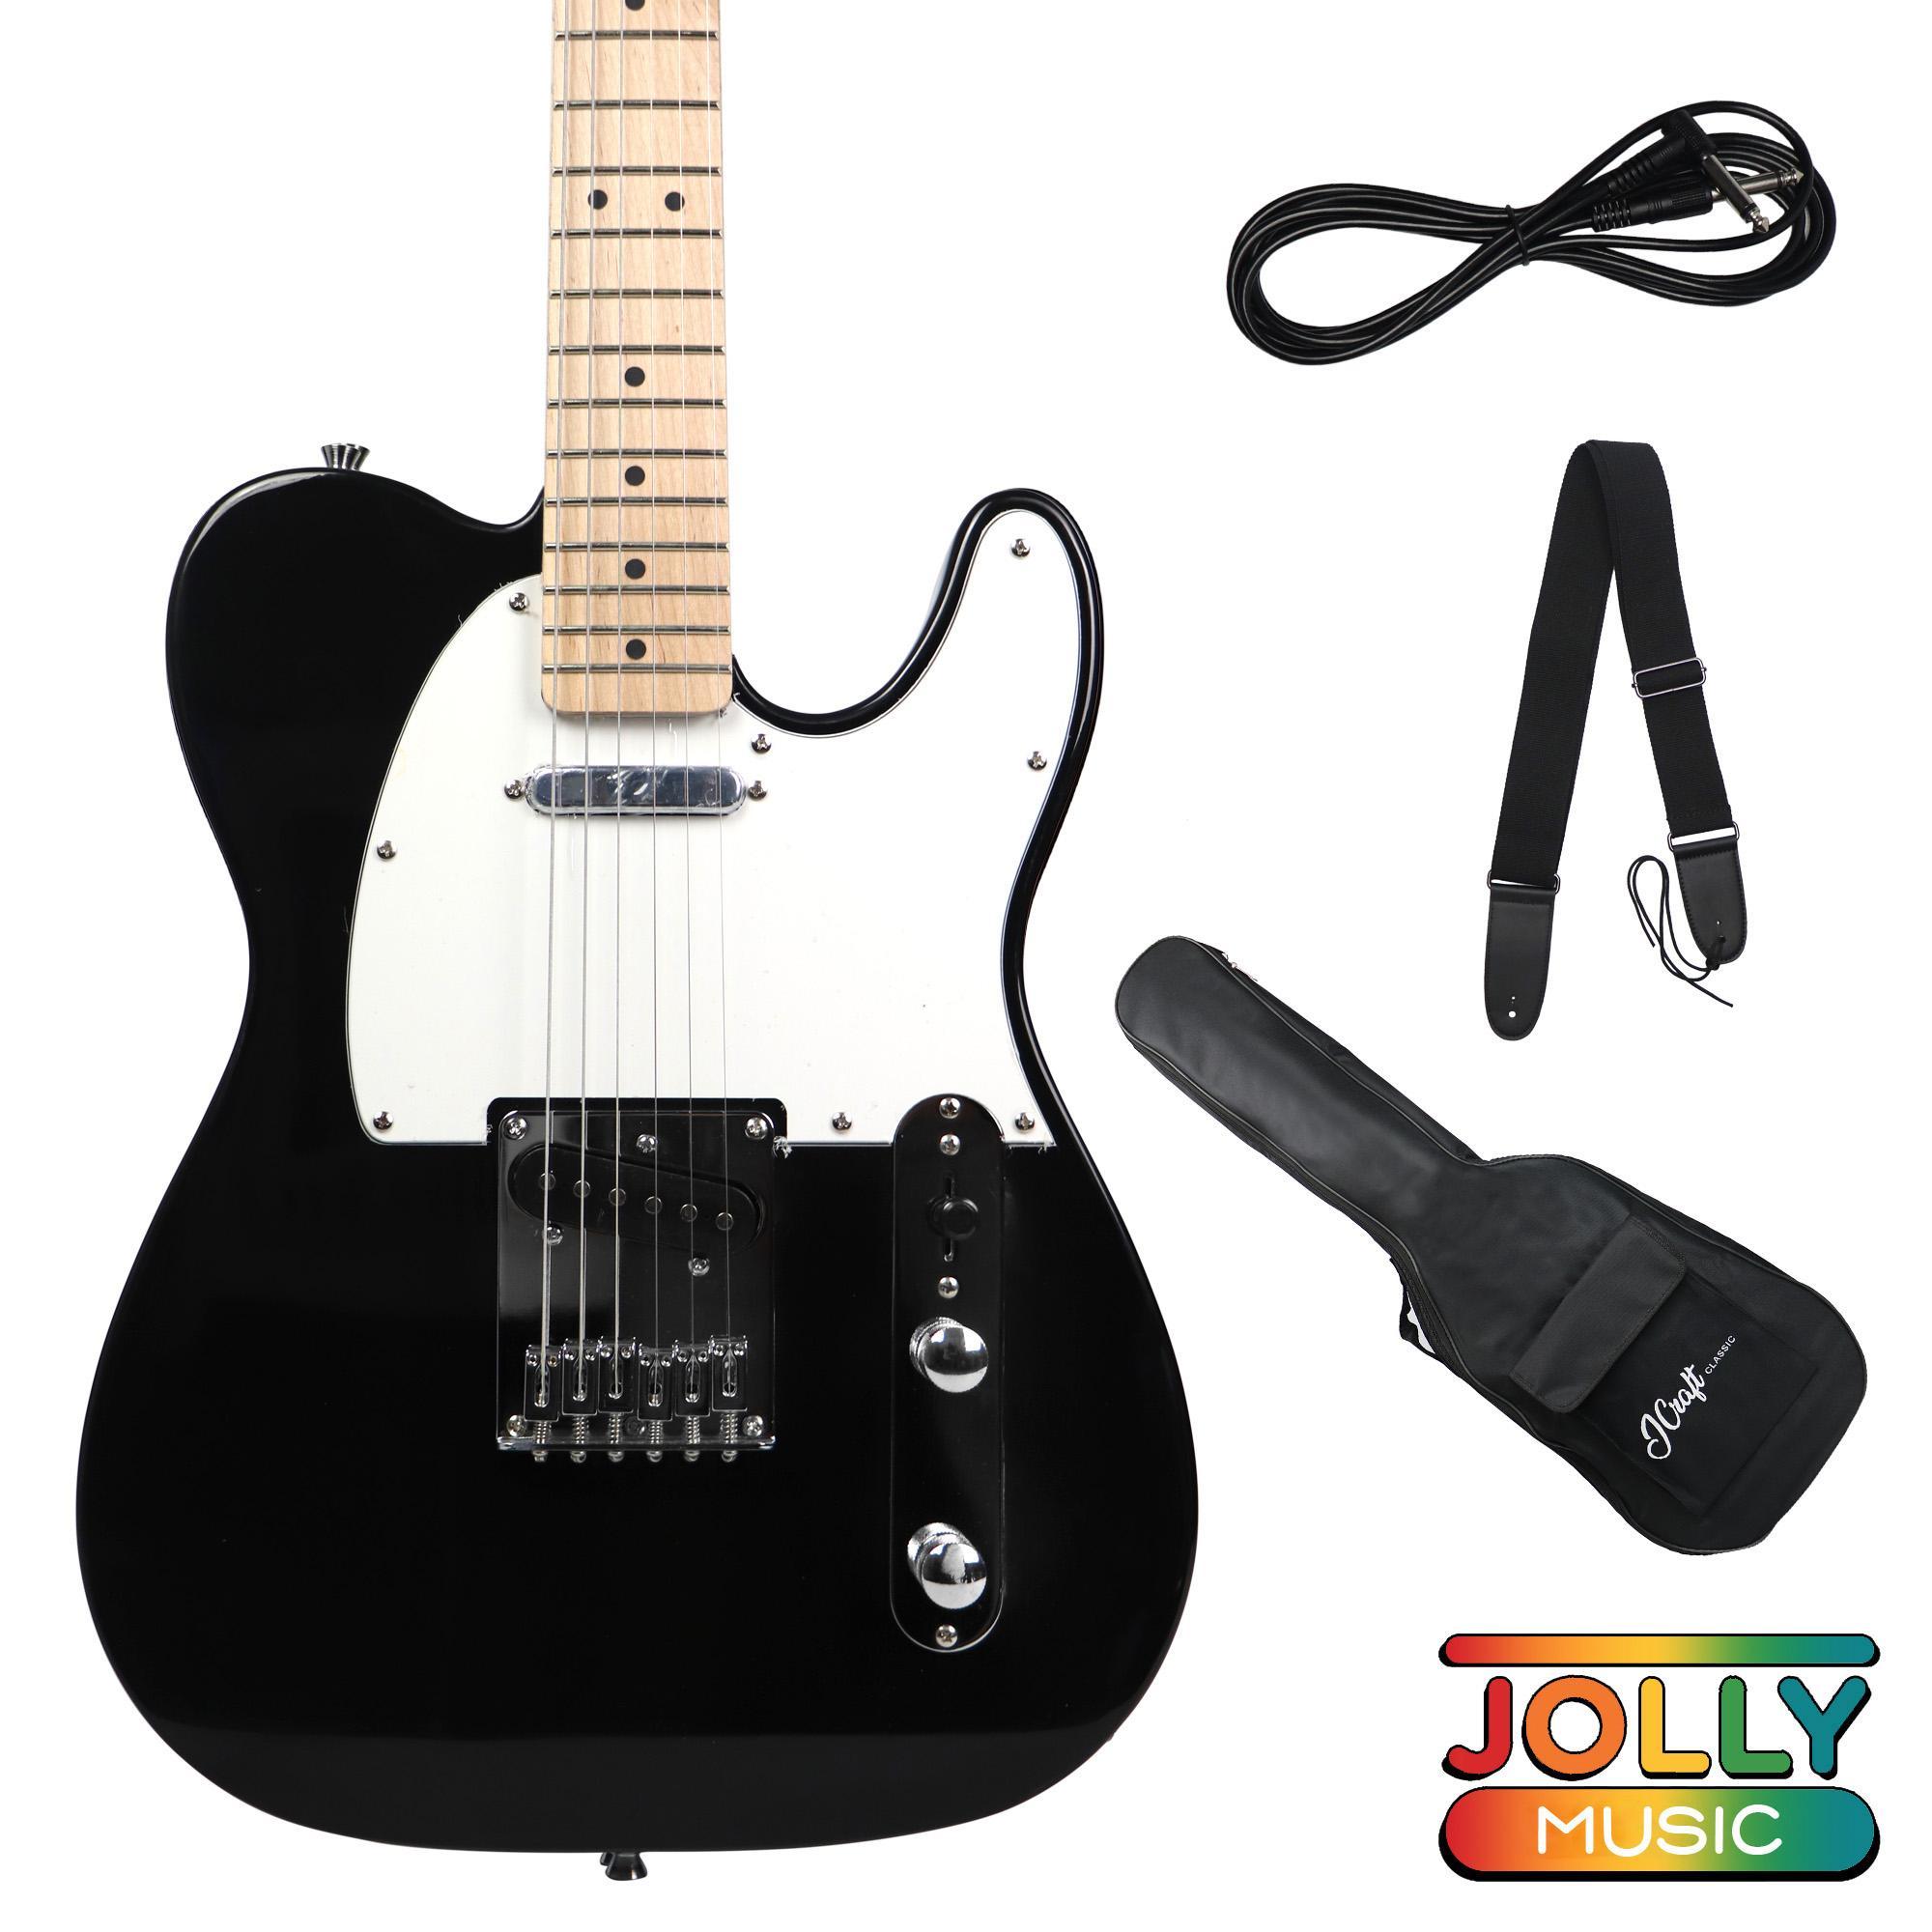 J-Craft Classic Series T-1 Telecaster Electric Guitar